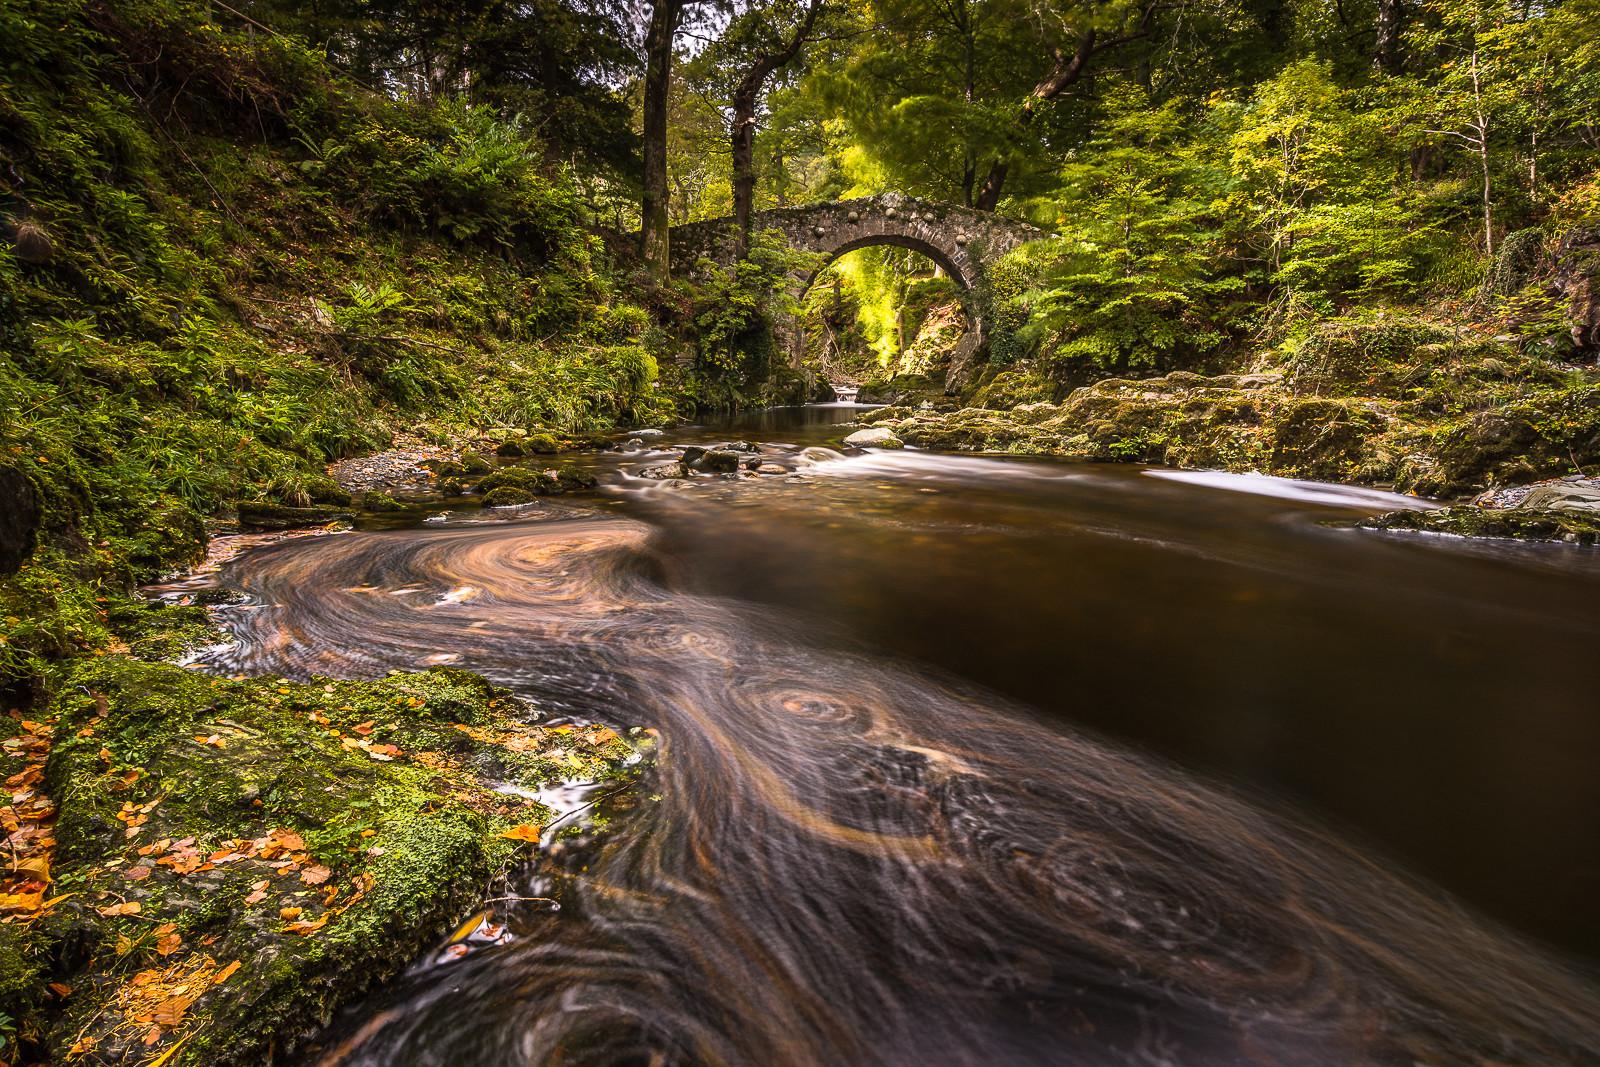 PDI - That Bridge by Wayne Hazlett (11 marks)